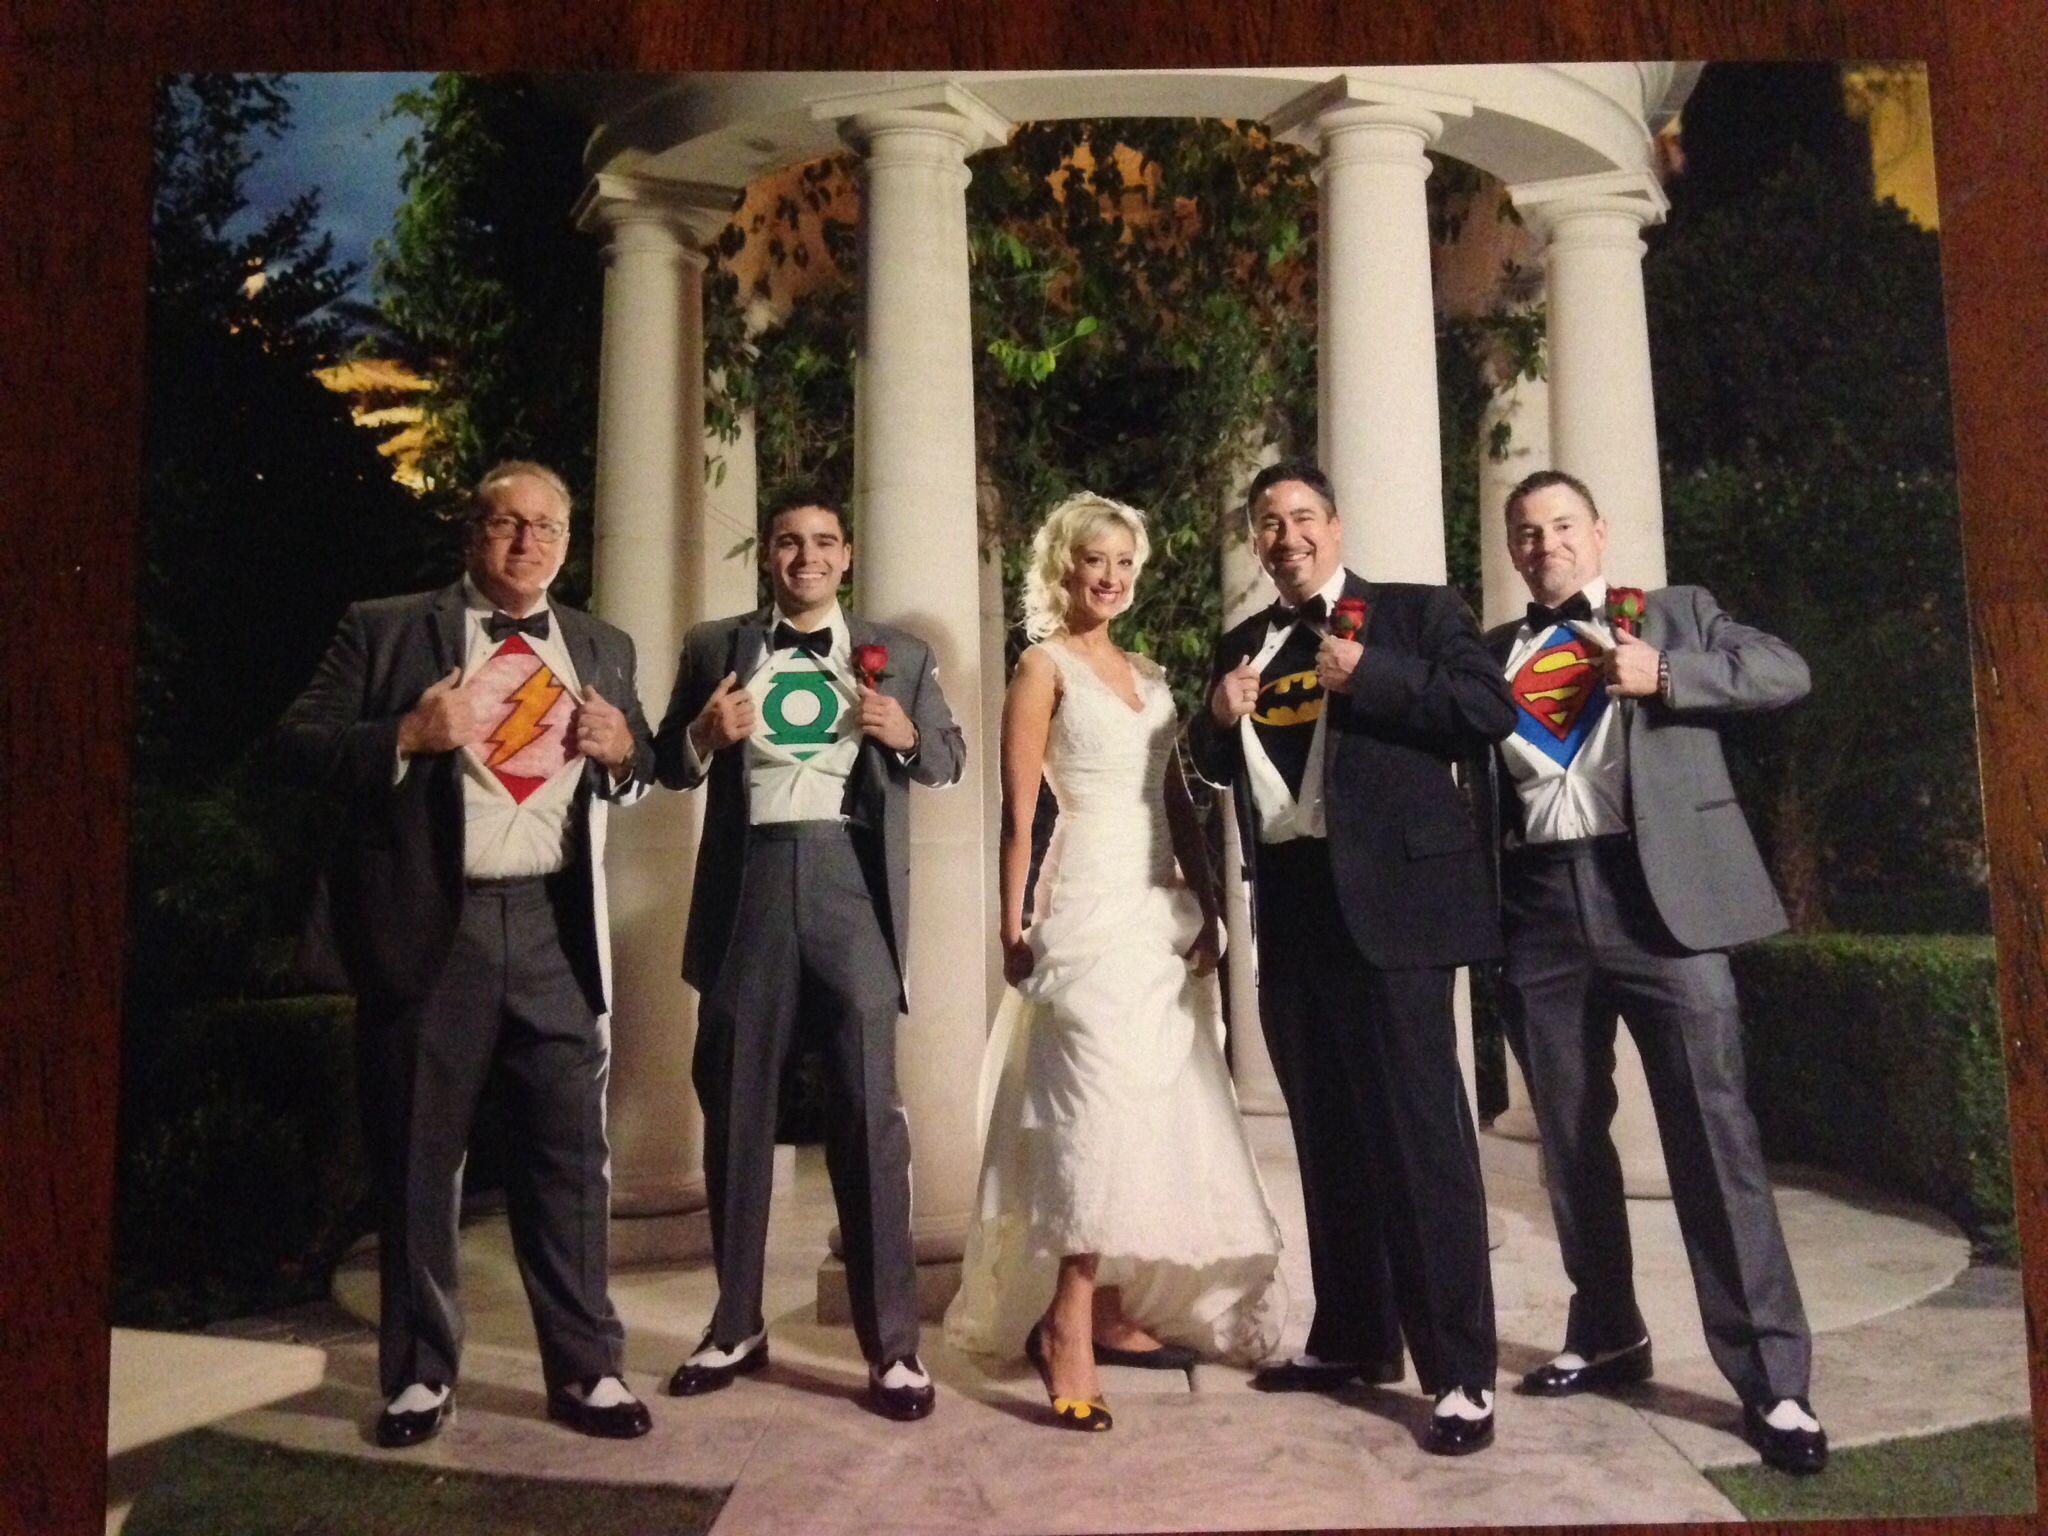 Our Superhero Wedding May 2014 in Vegas at Caesars Palace